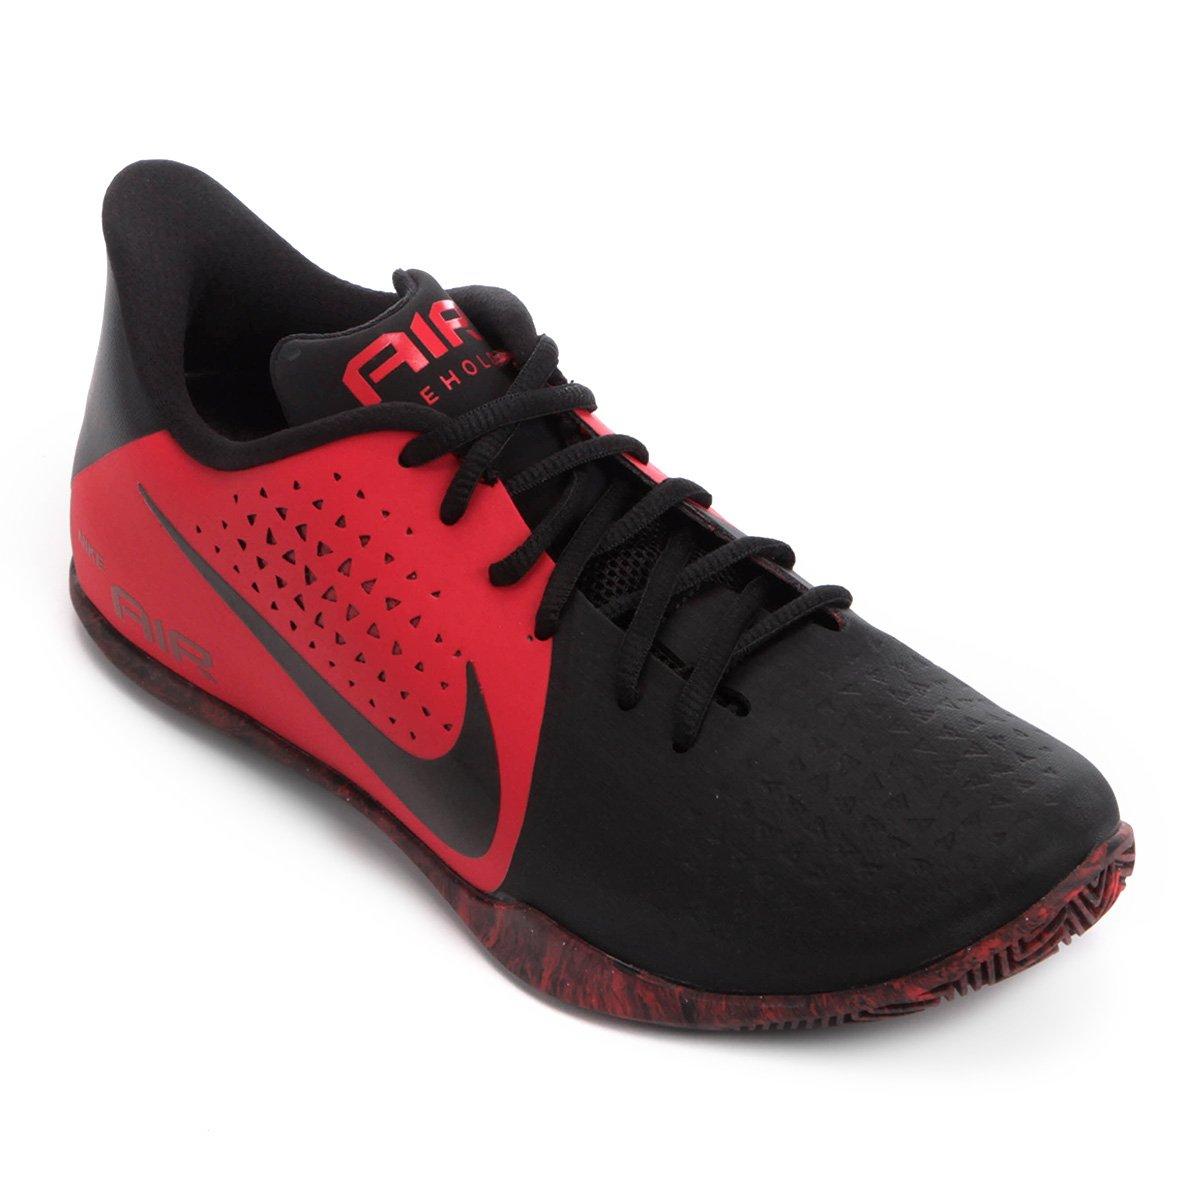 Tênis Nike Behold Air Behold Nike Low Masculino Compre Agora Netsapatos 4c5006